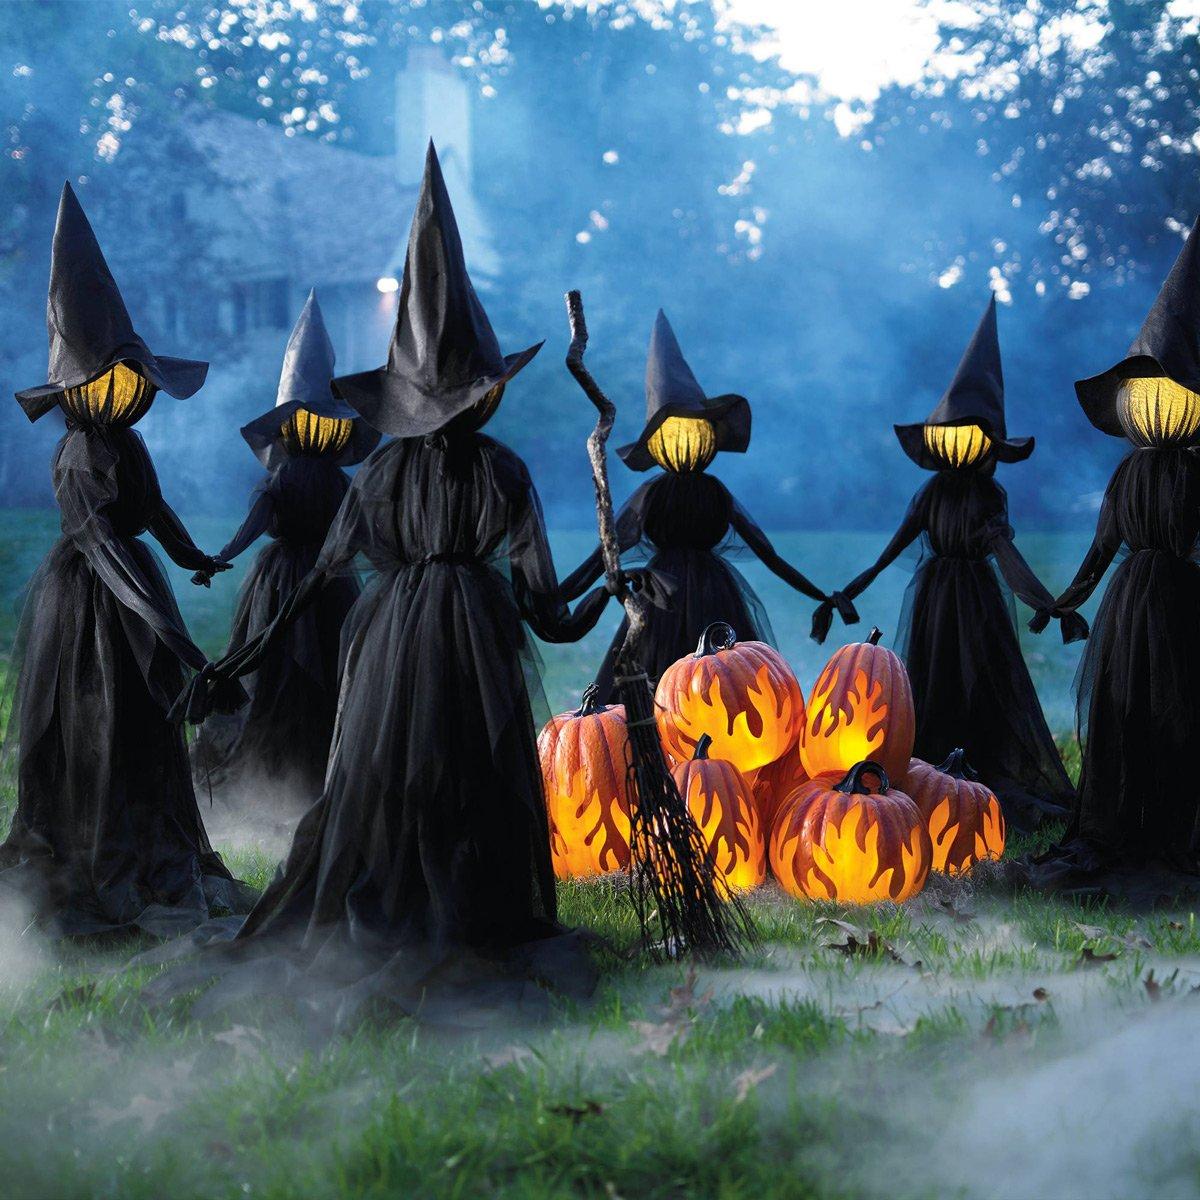 Creepy Illuminated Halloween Yard Witches The Green Head